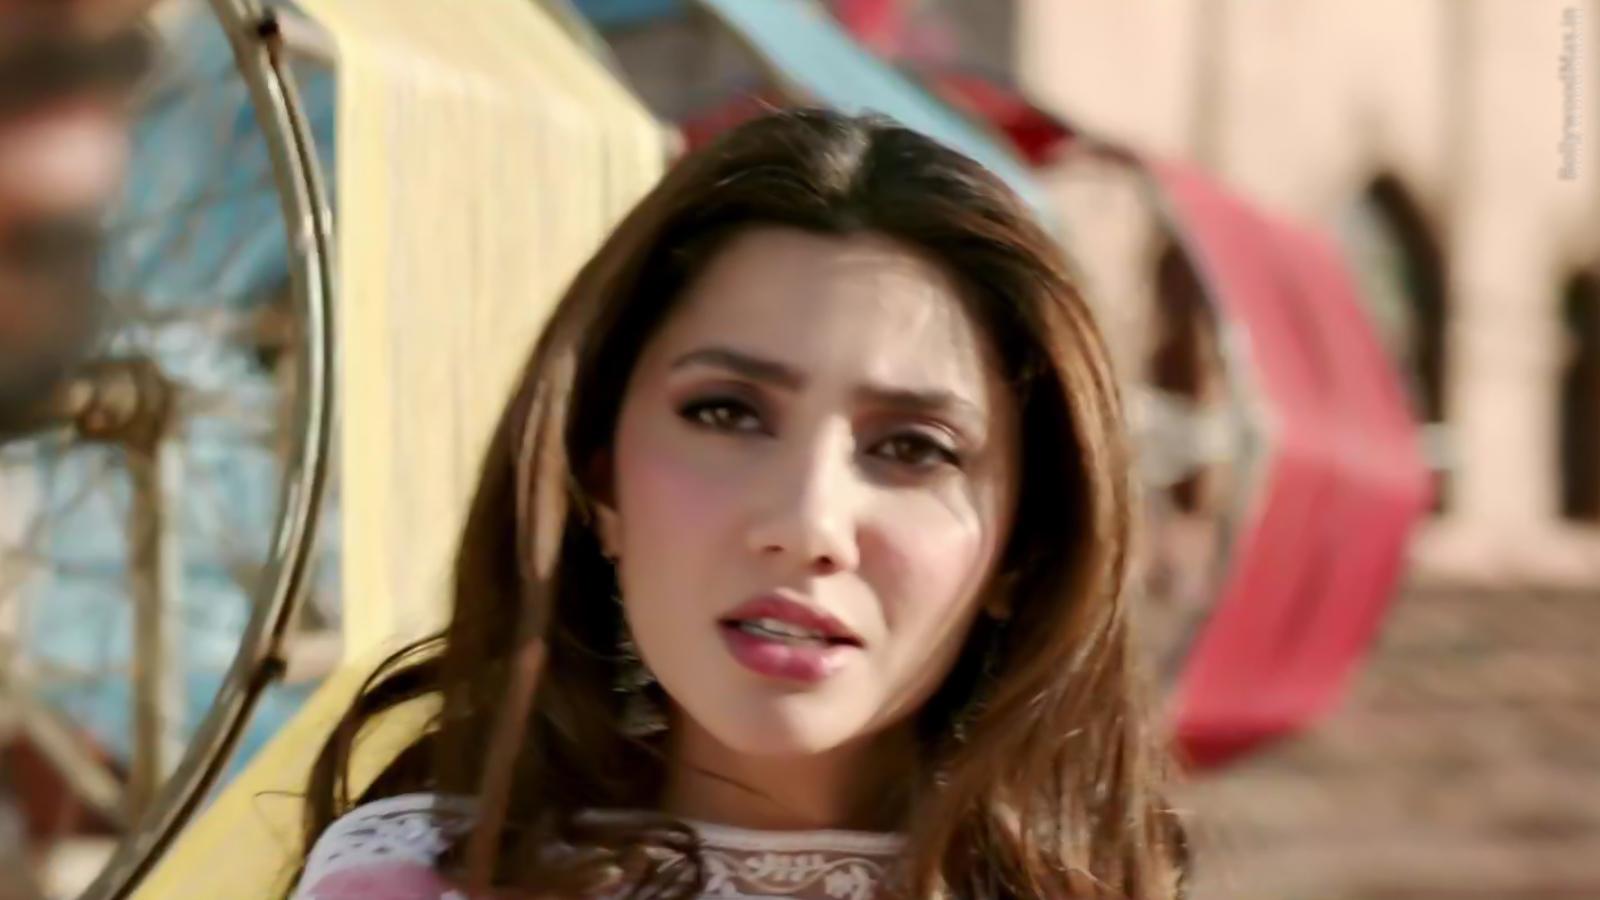 Mahira Khan - Raees - Hot Pakistani Actress Picture And Images-4689